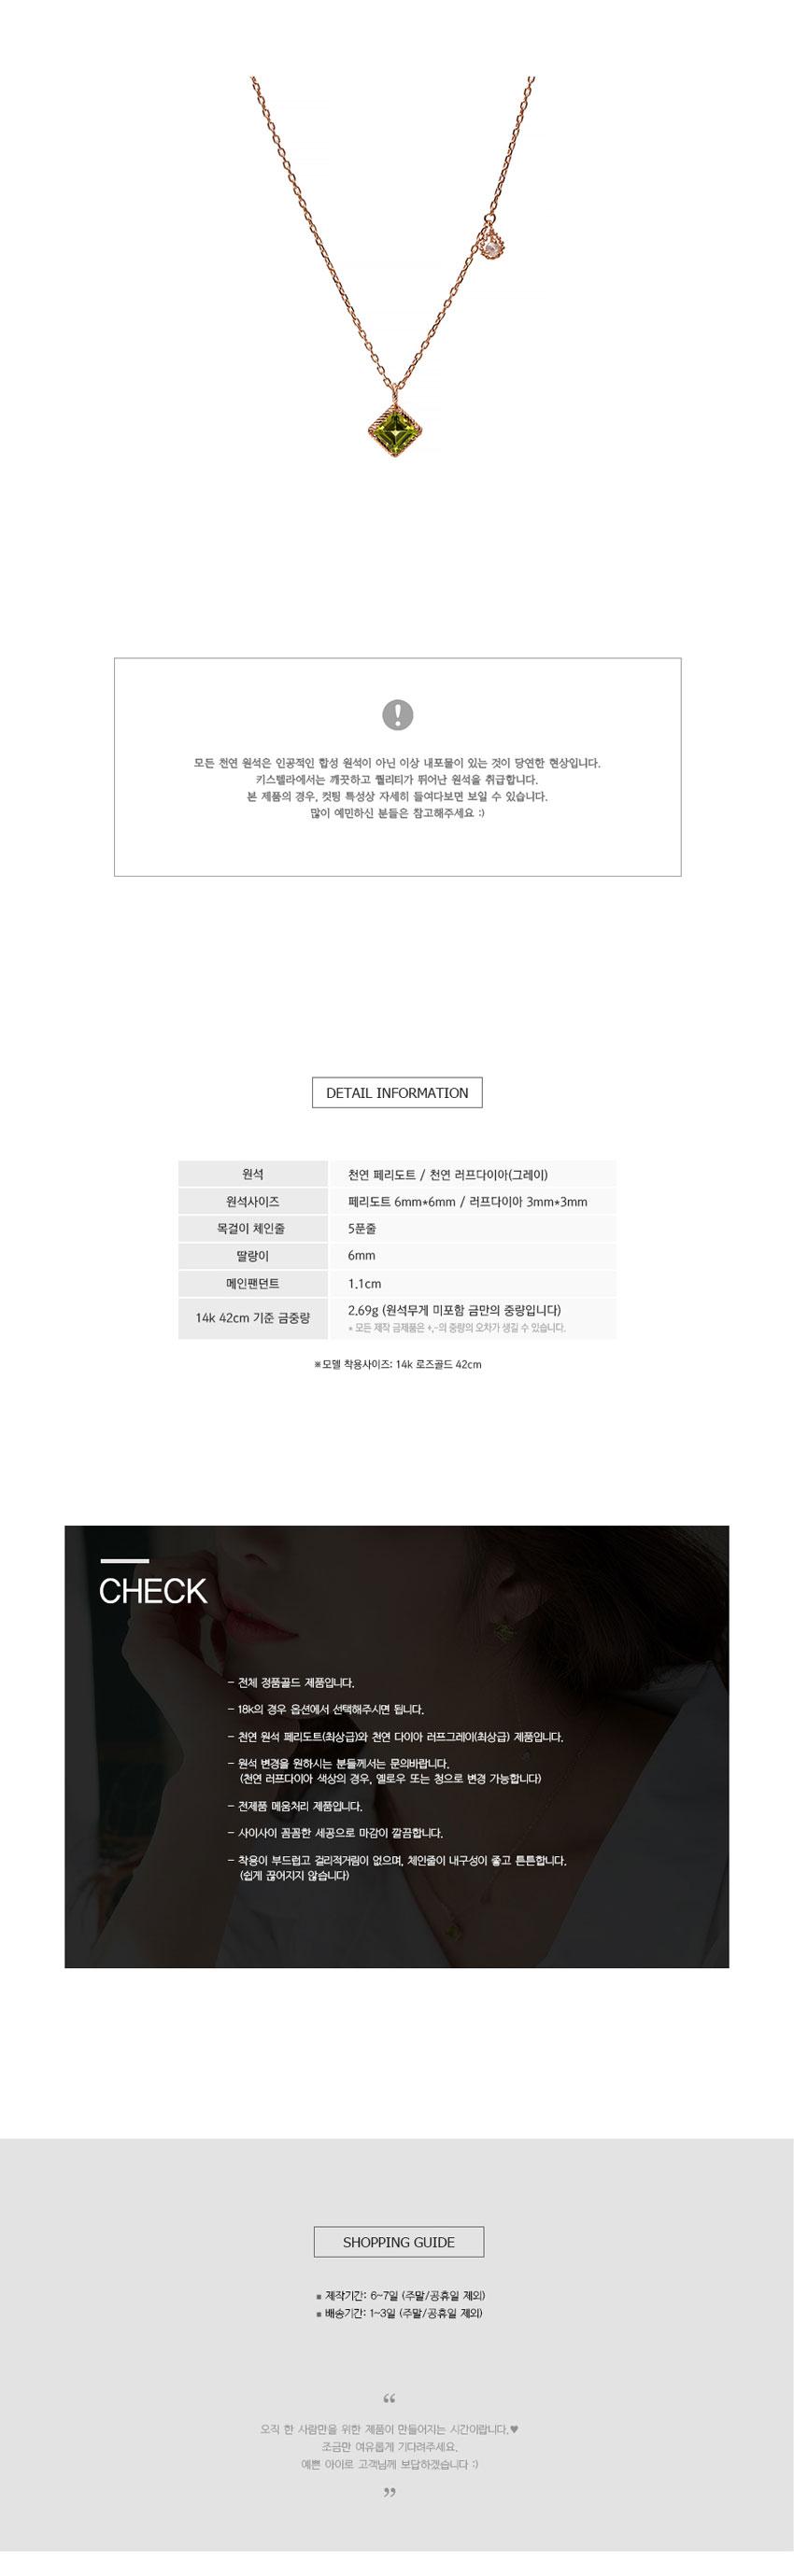 14k 18k 천연원석 페리도트 목걸이 - 키스텔라, 377,000원, 골드, 14K/18K